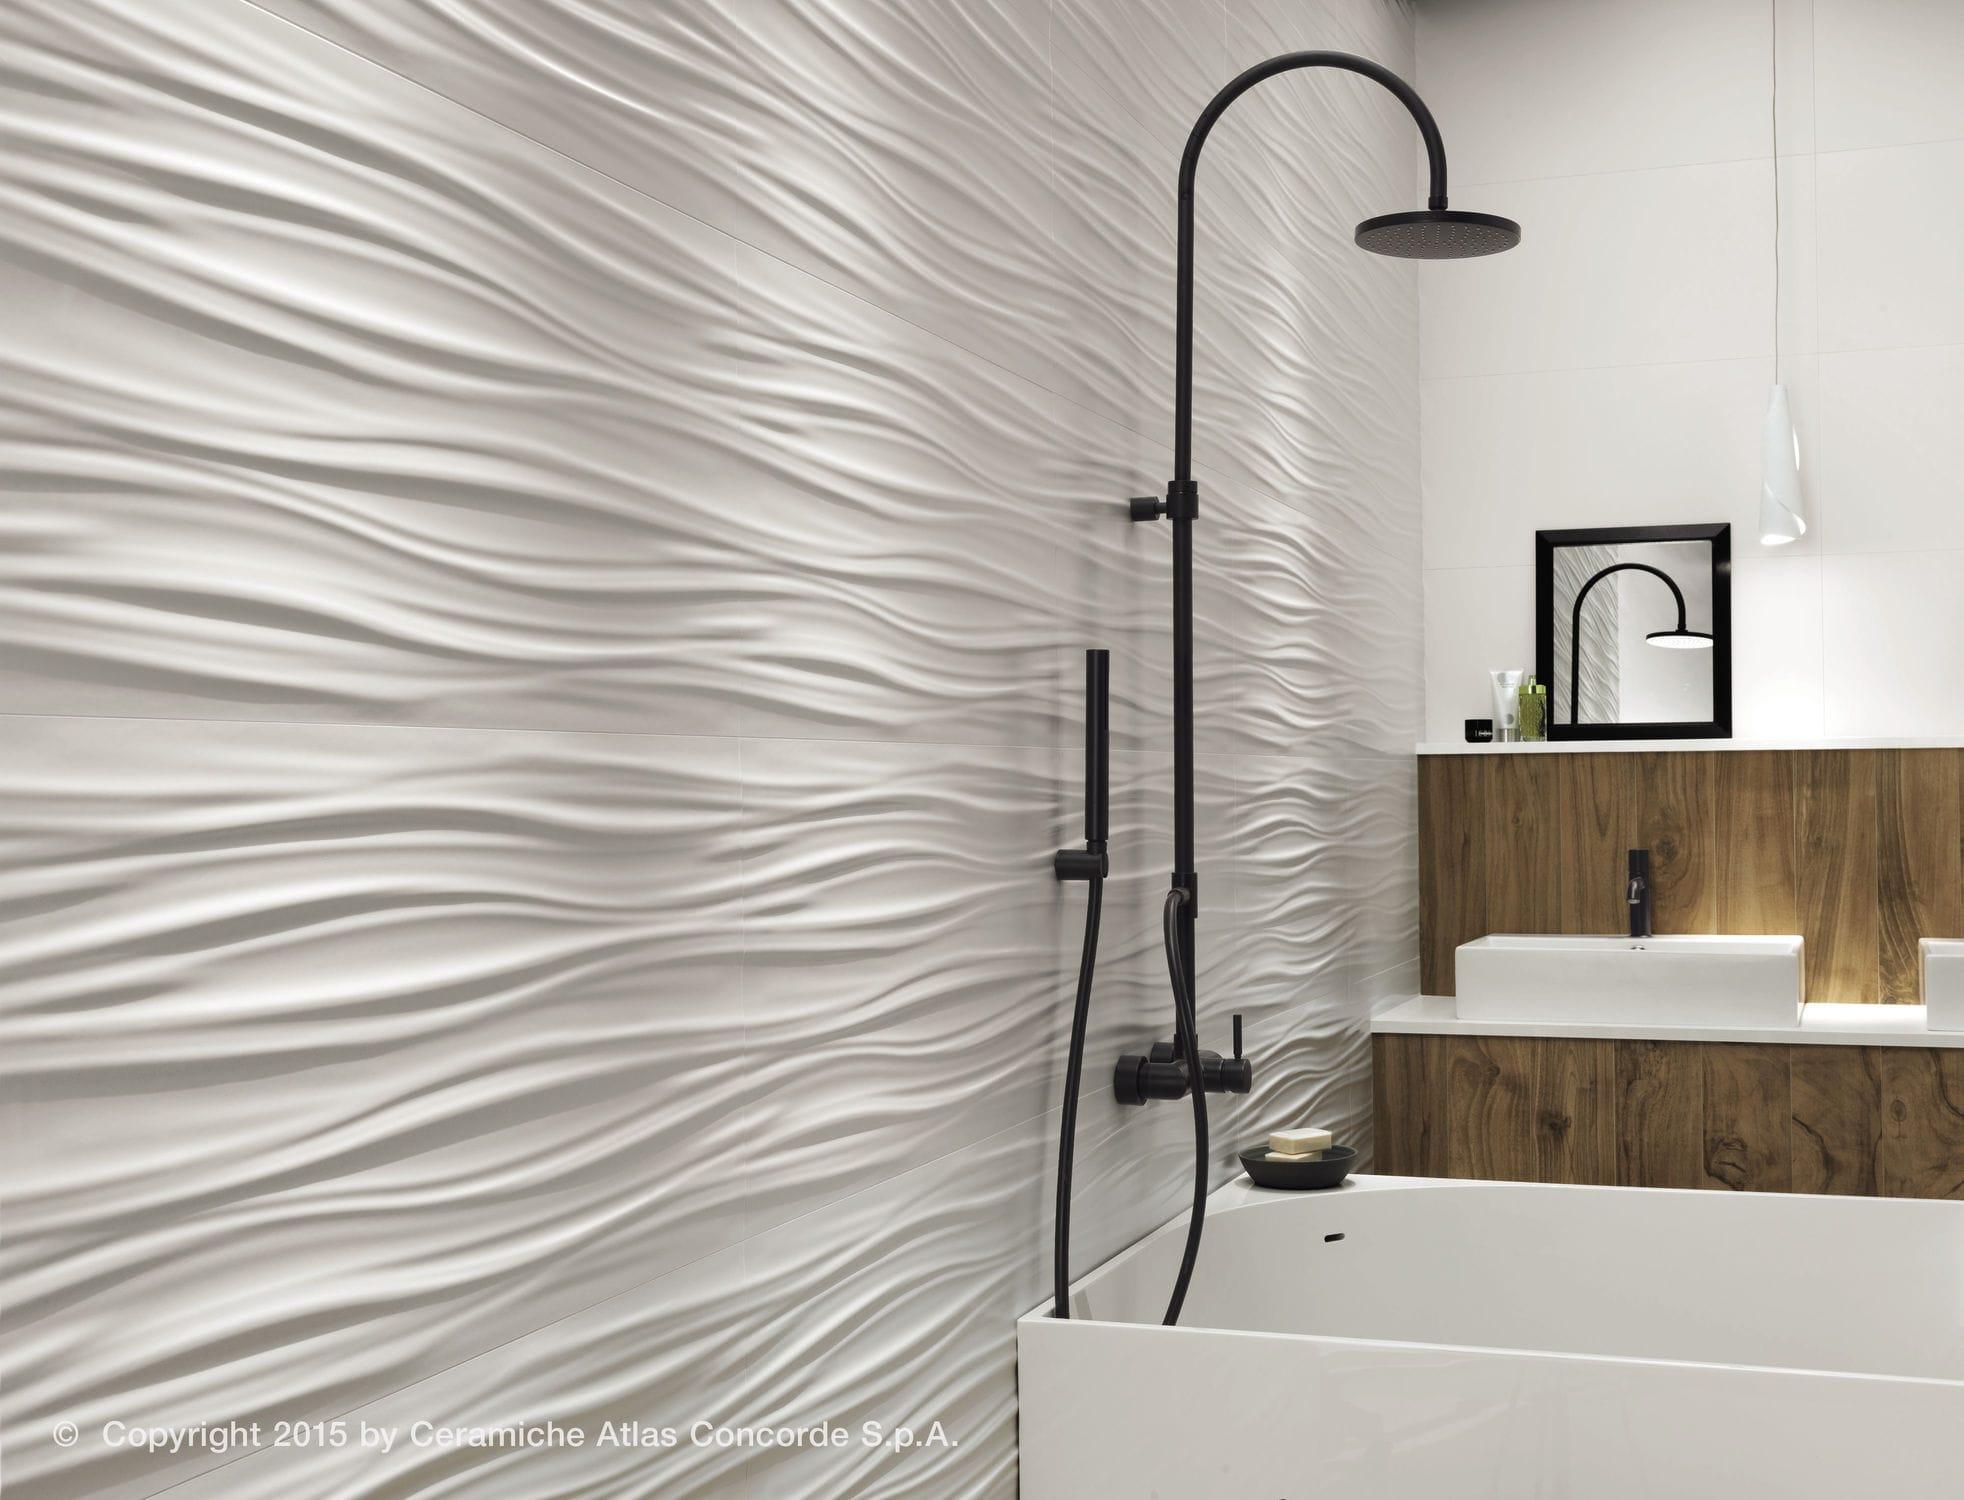 Wave effect en salle de bain